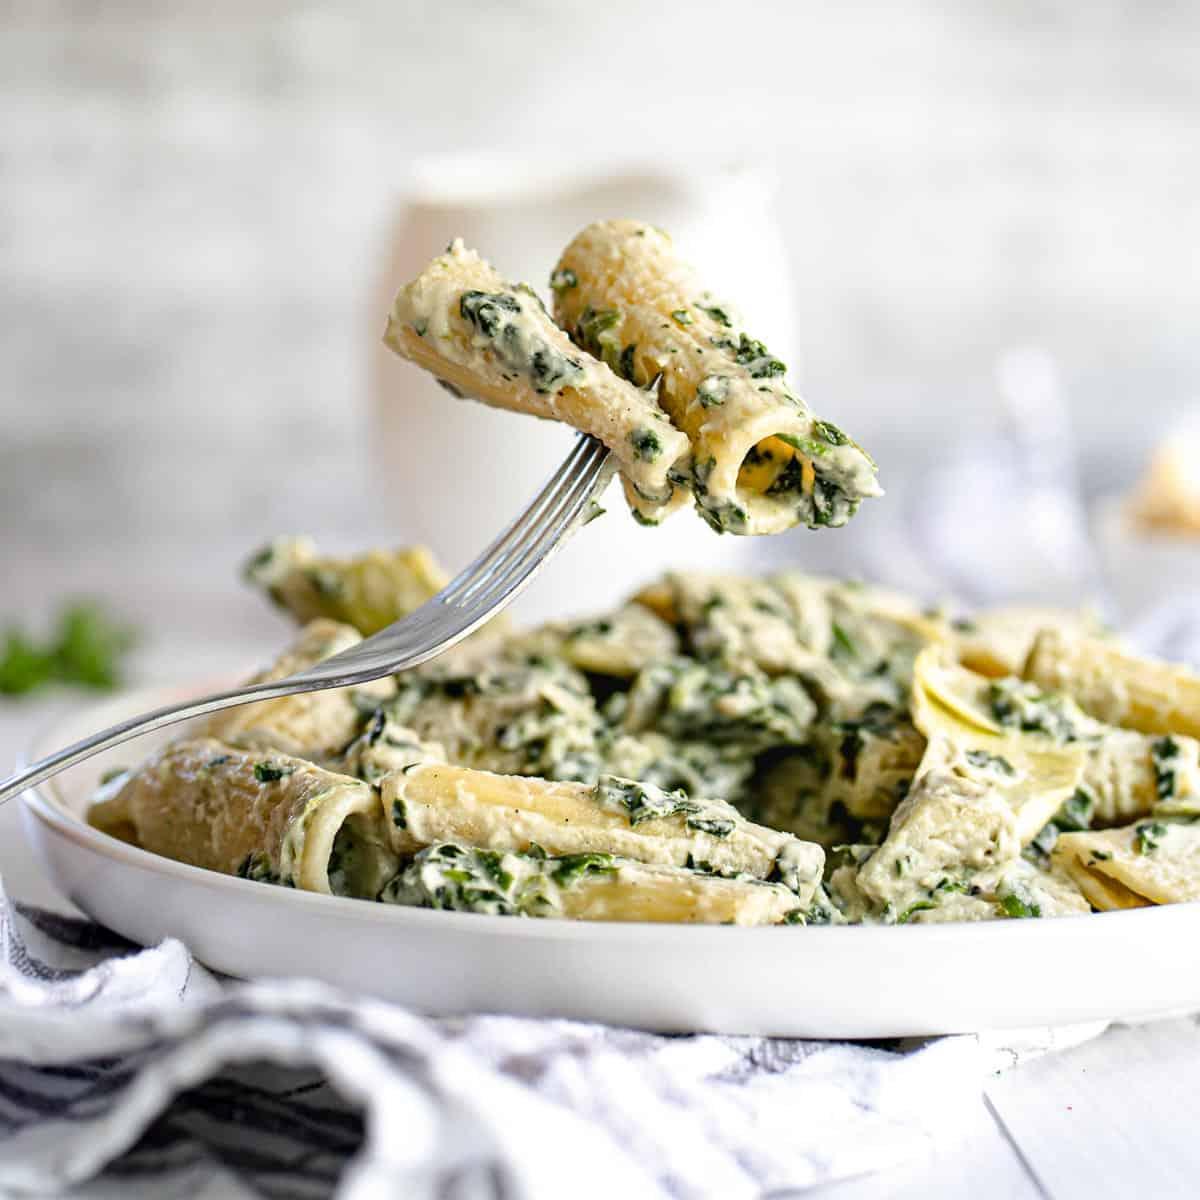 Fork holding rigatoni with spinach artichoke Alfredo sauce.